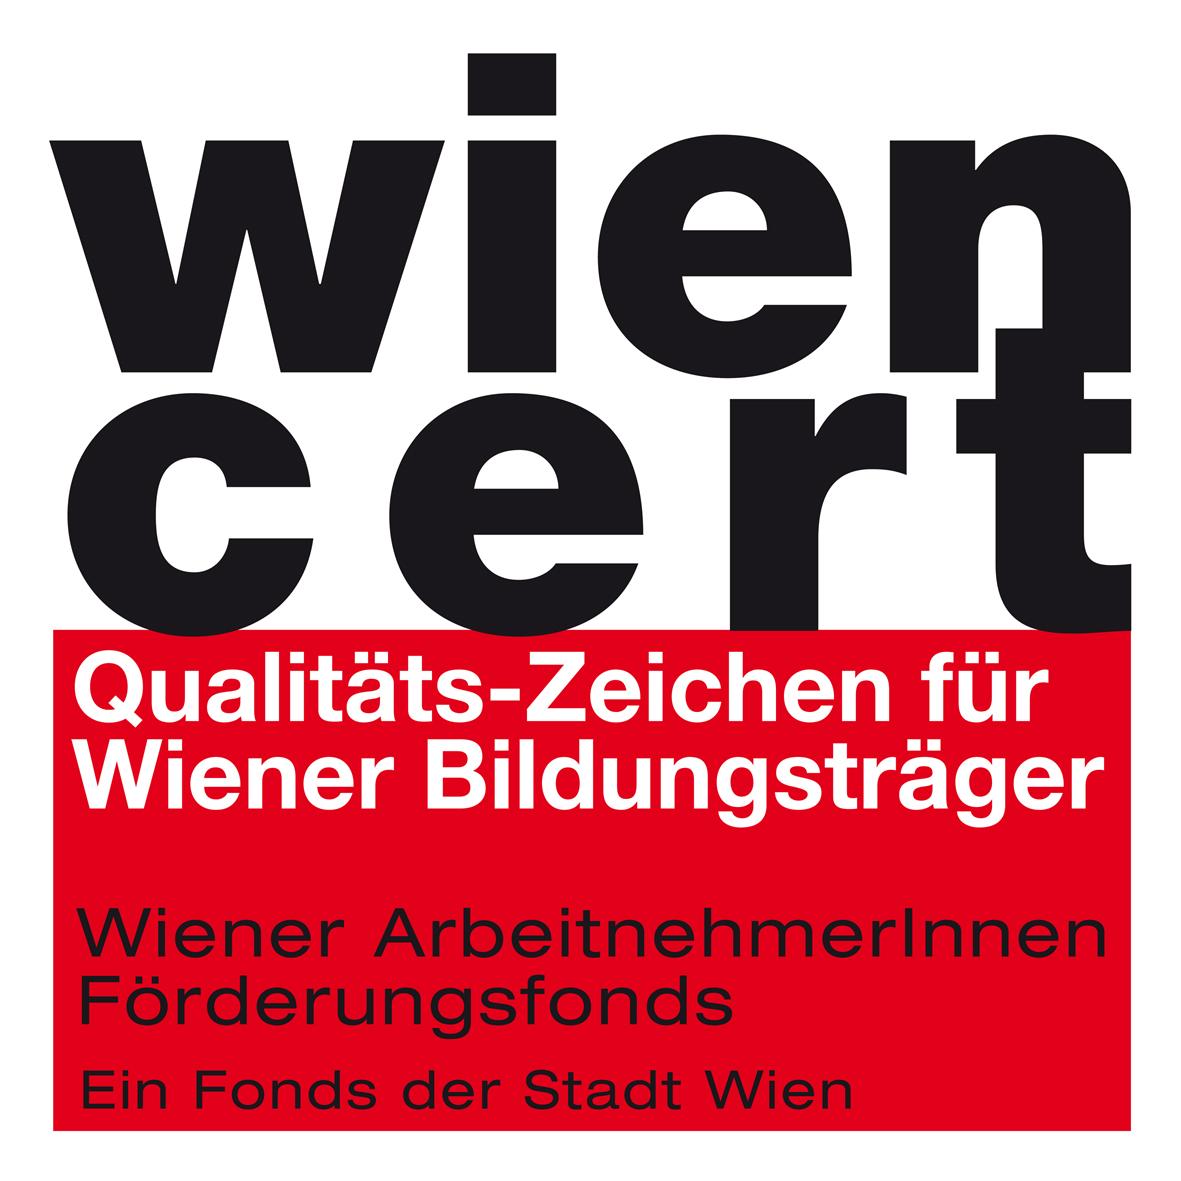 Wien Cert 5x5 RGB RZ - Region Wien u. Österreich-Ost